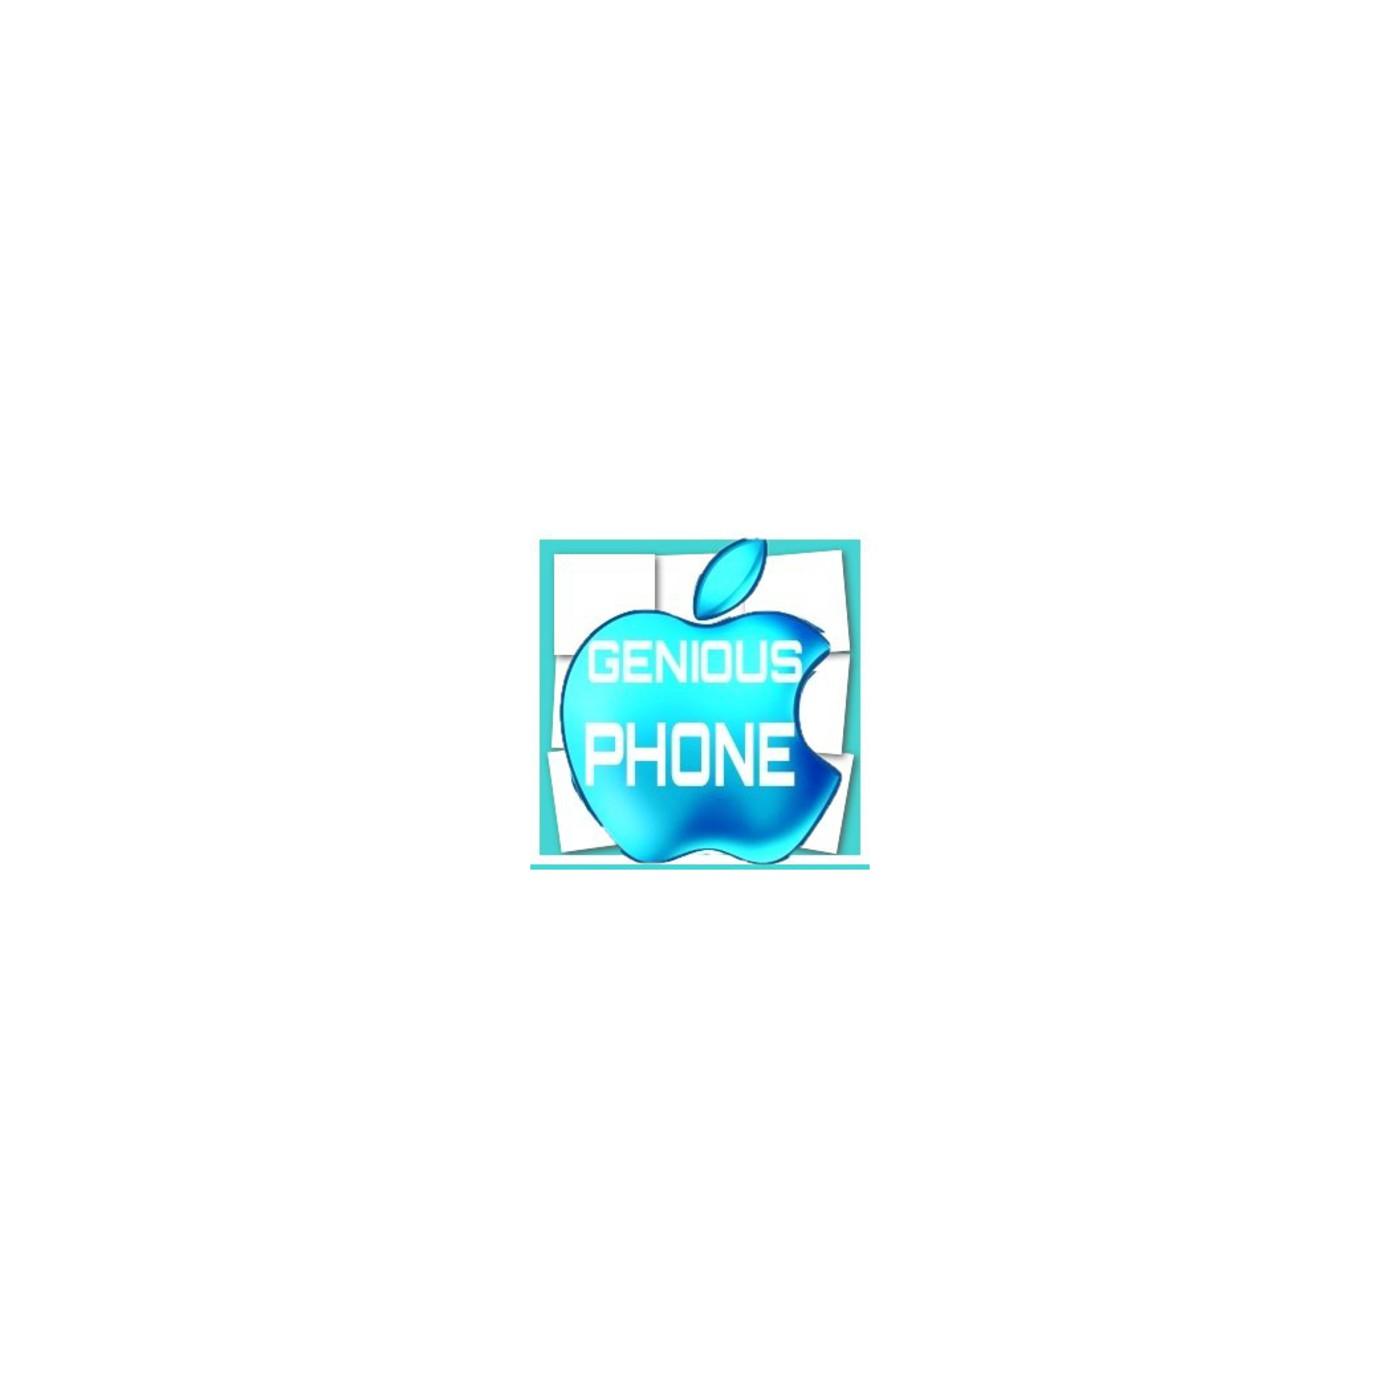 <![CDATA[Genious Phone]]>